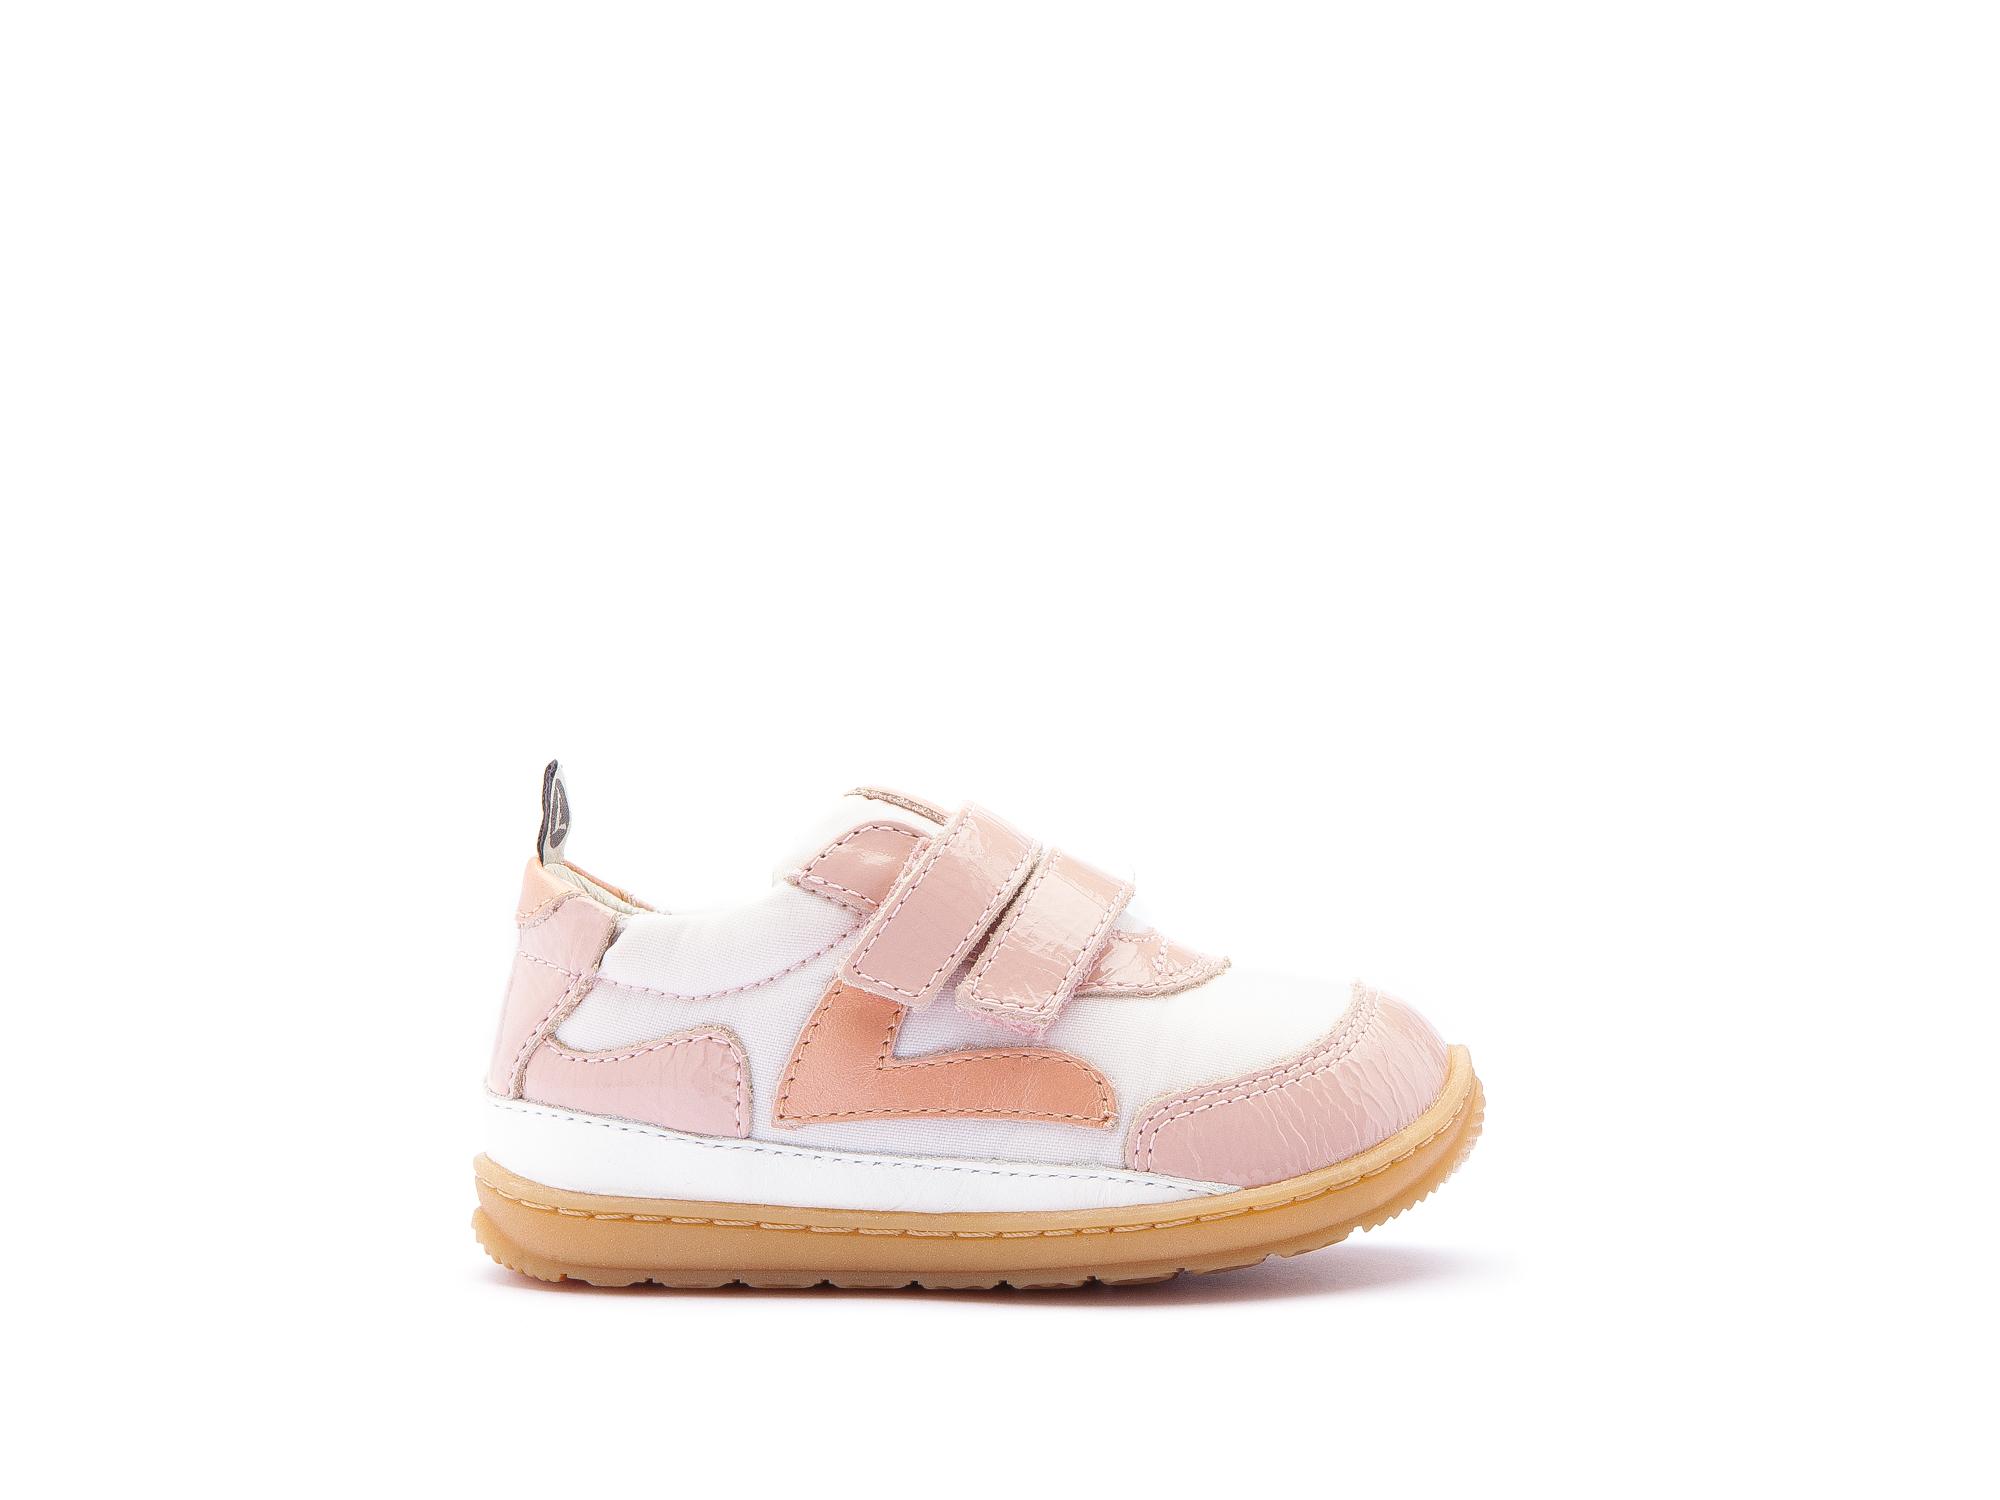 Sneaker Casual Jumpy Light Pink Nylon/ Patent Blush Baby 0 à 2 anos - 1